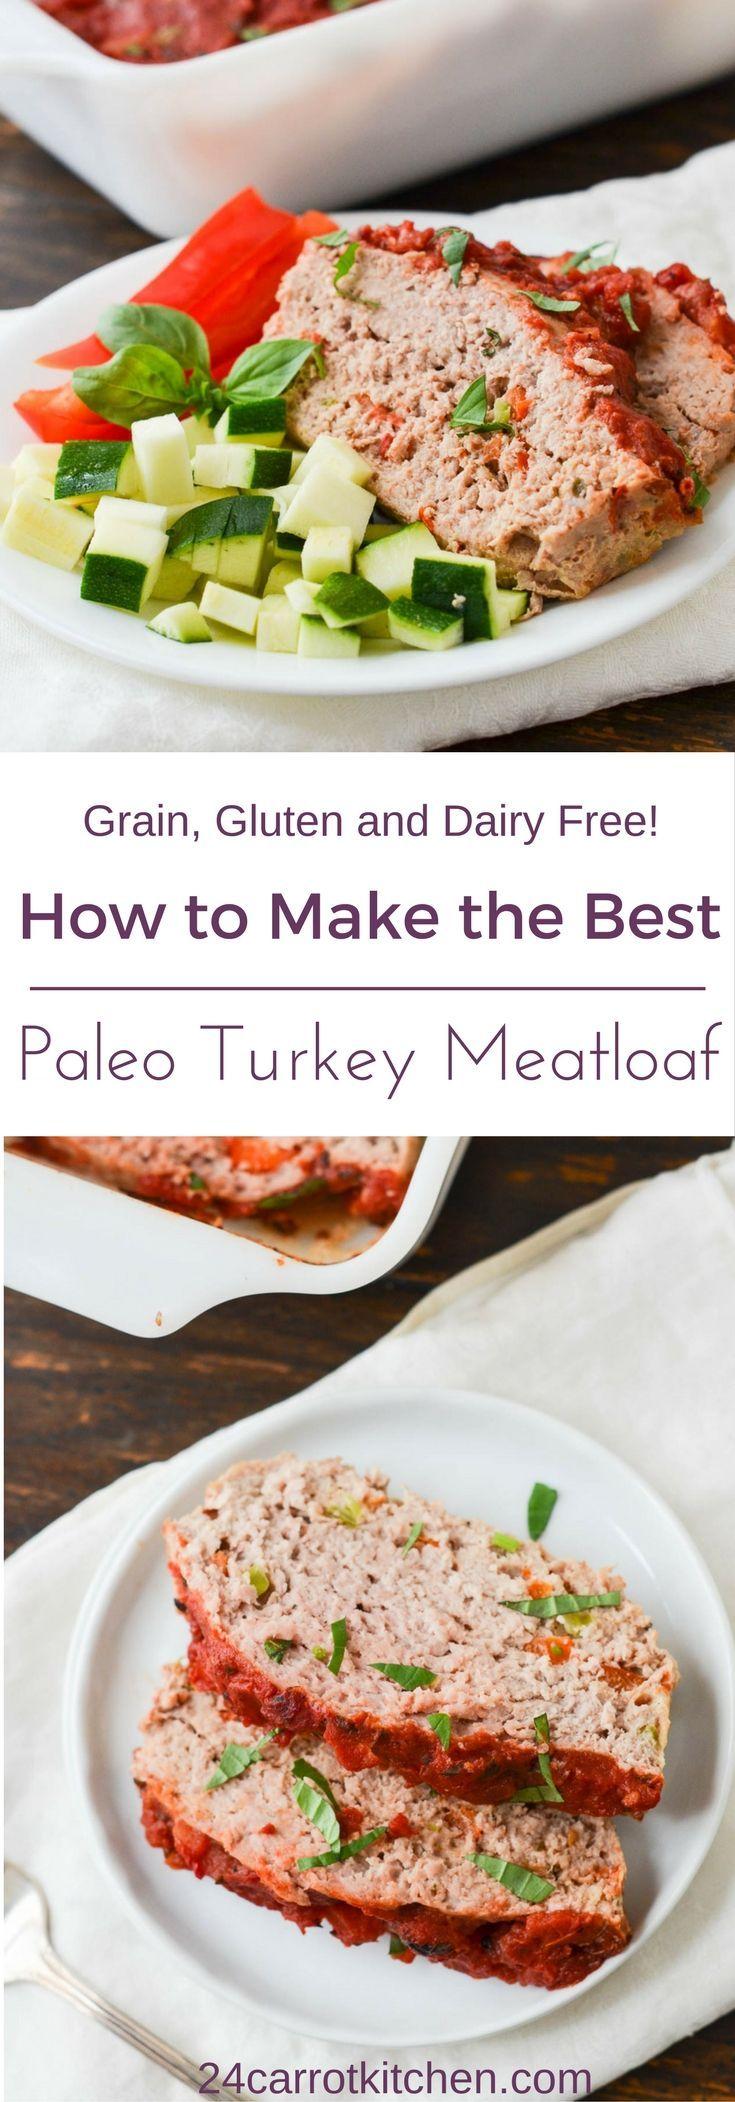 paleo turkey meatloaf pin 24 carrot kitchen paleo recipe idea rh pinterest com